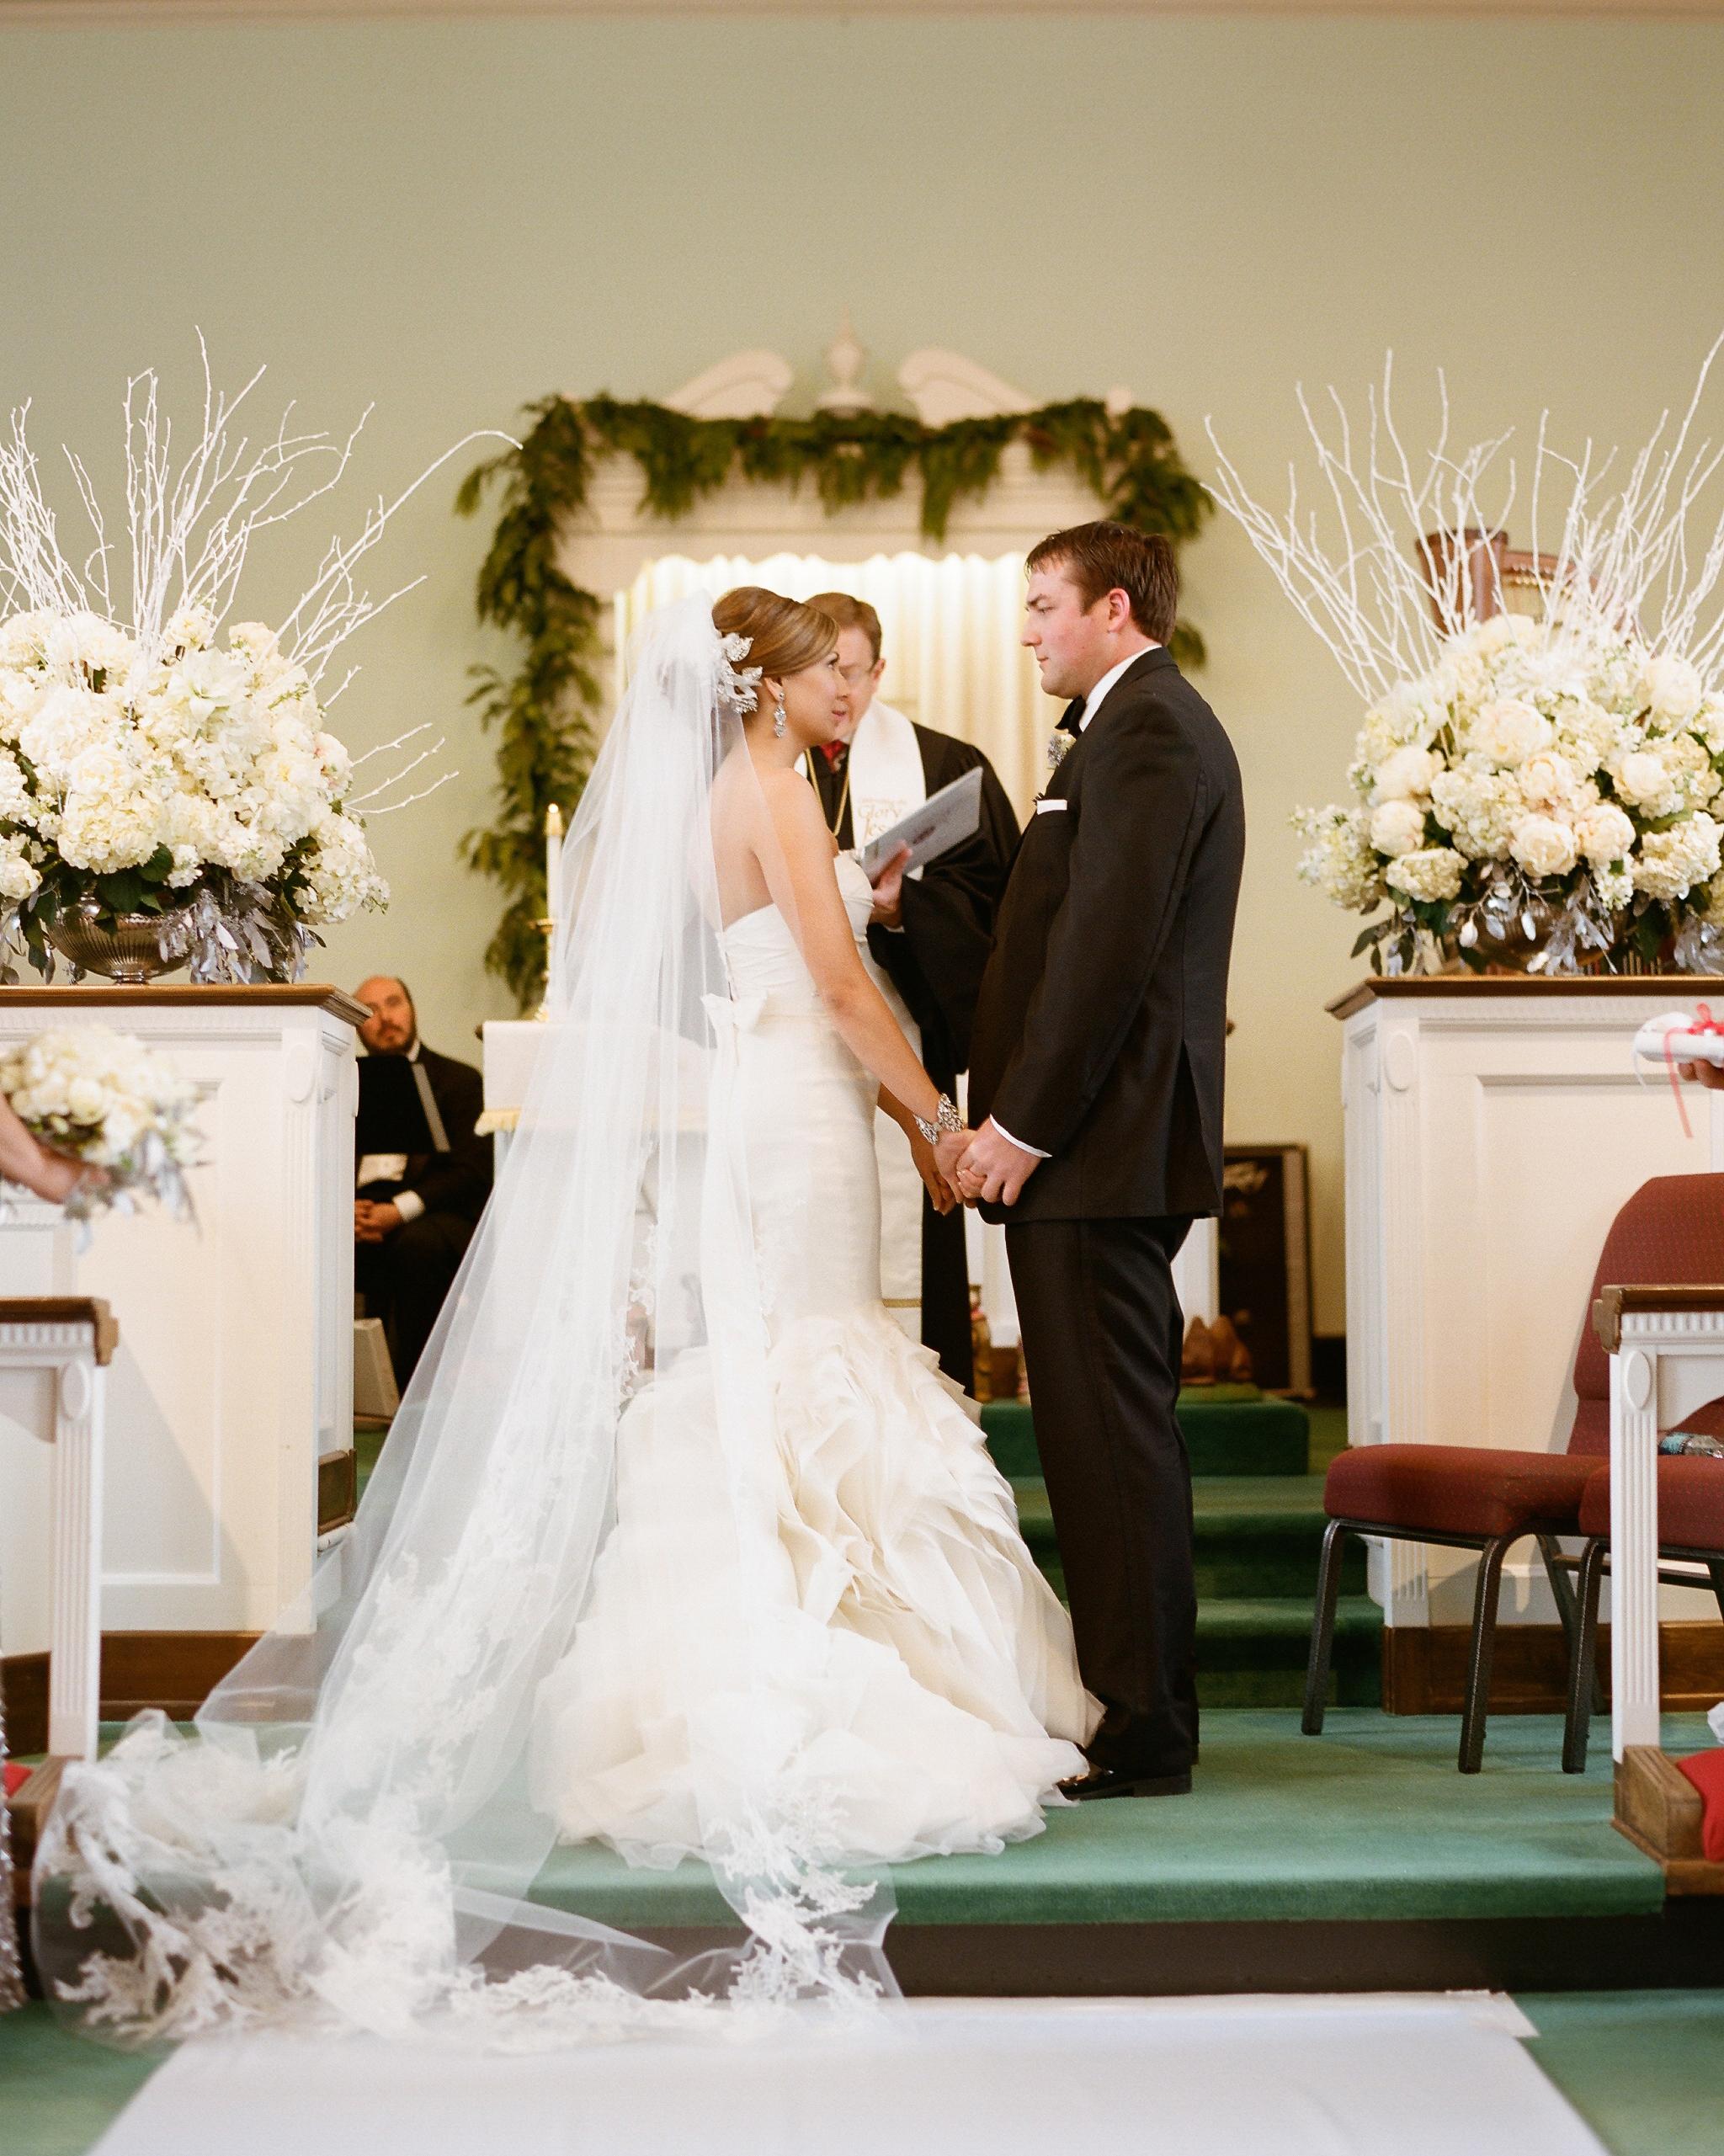 paige-michael-wedding-ceremony-0710-s112431-1215.jpg